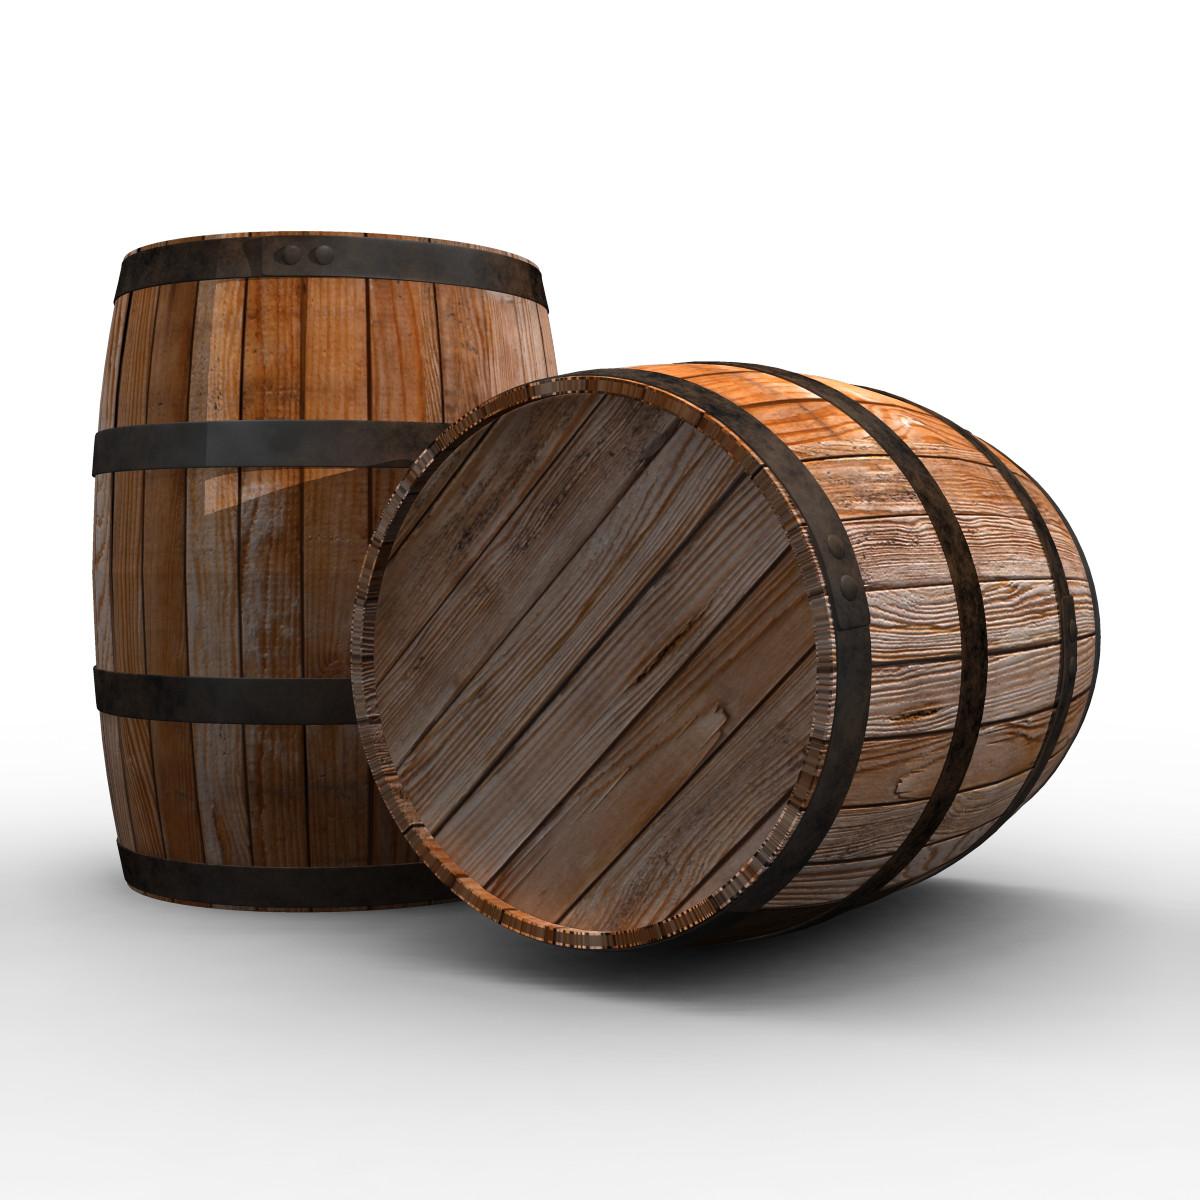 Wooden barrel top clipart clipart library download Free Wood Barrel Cliparts, Download Free Clip Art, Free Clip ... clipart library download